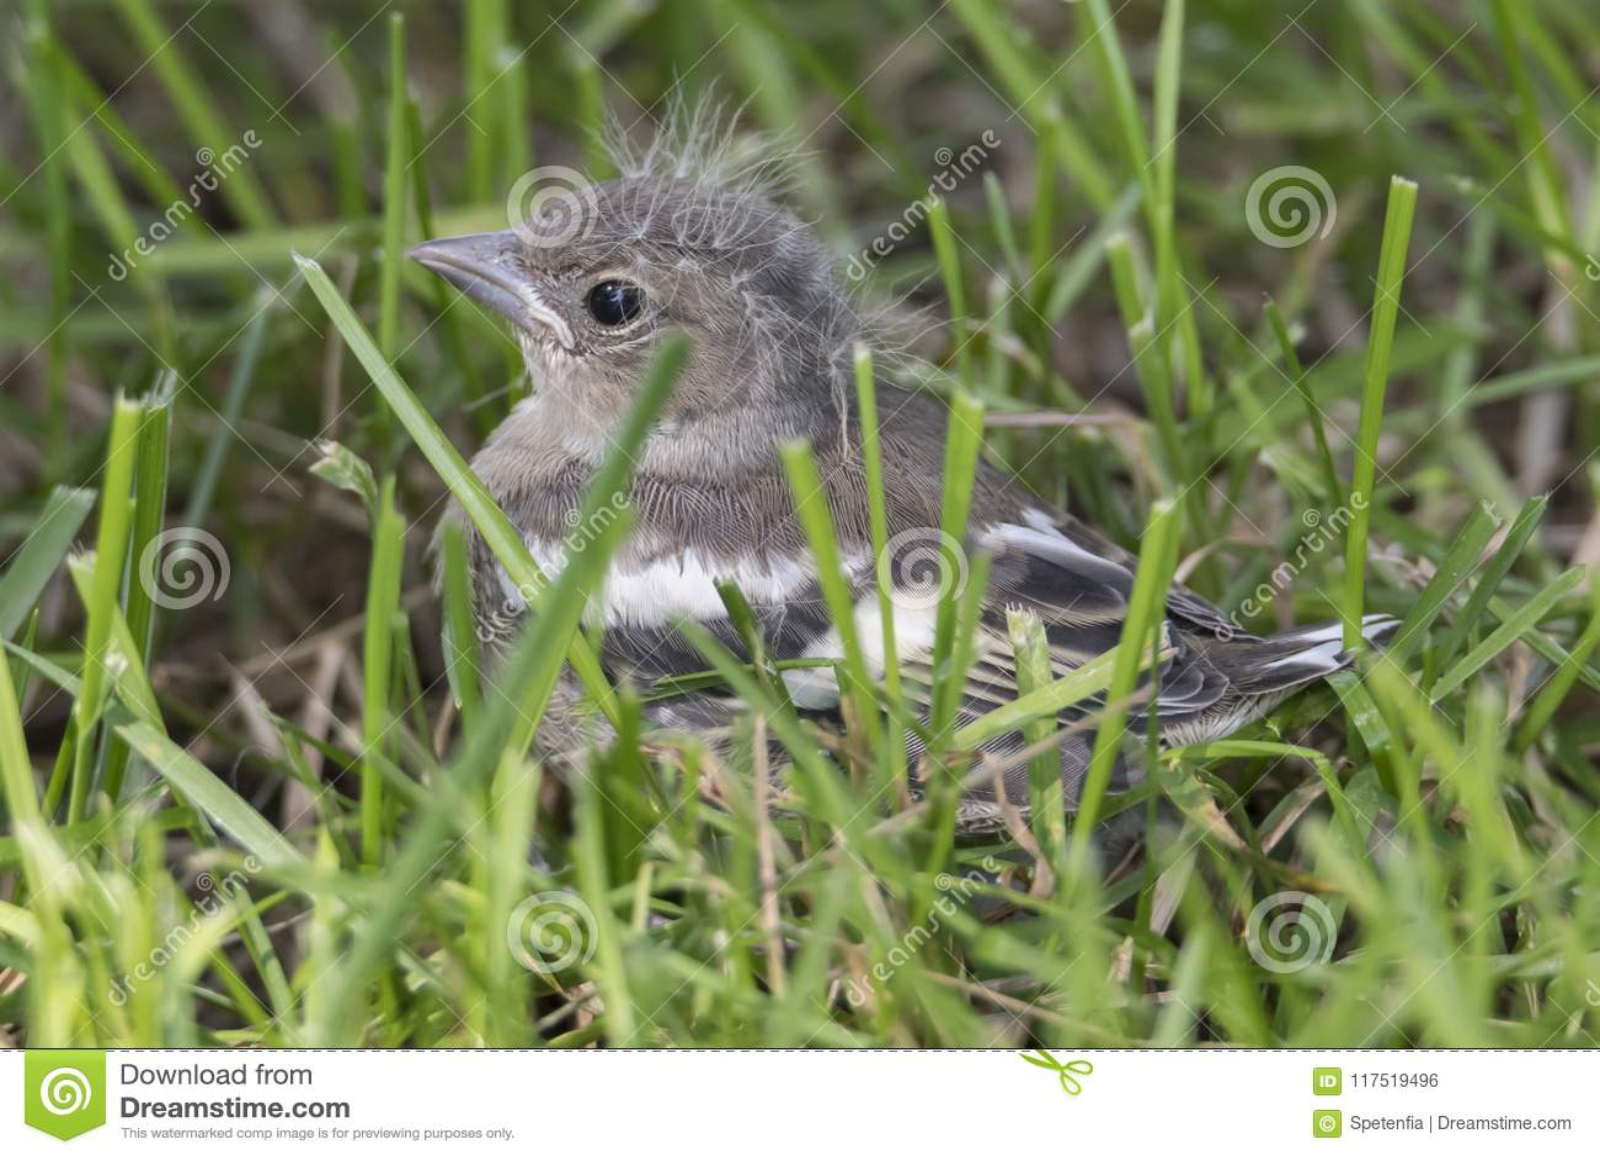 www μεγάλο πουλί φωτογραφίες ο Ομπάμα πίπα